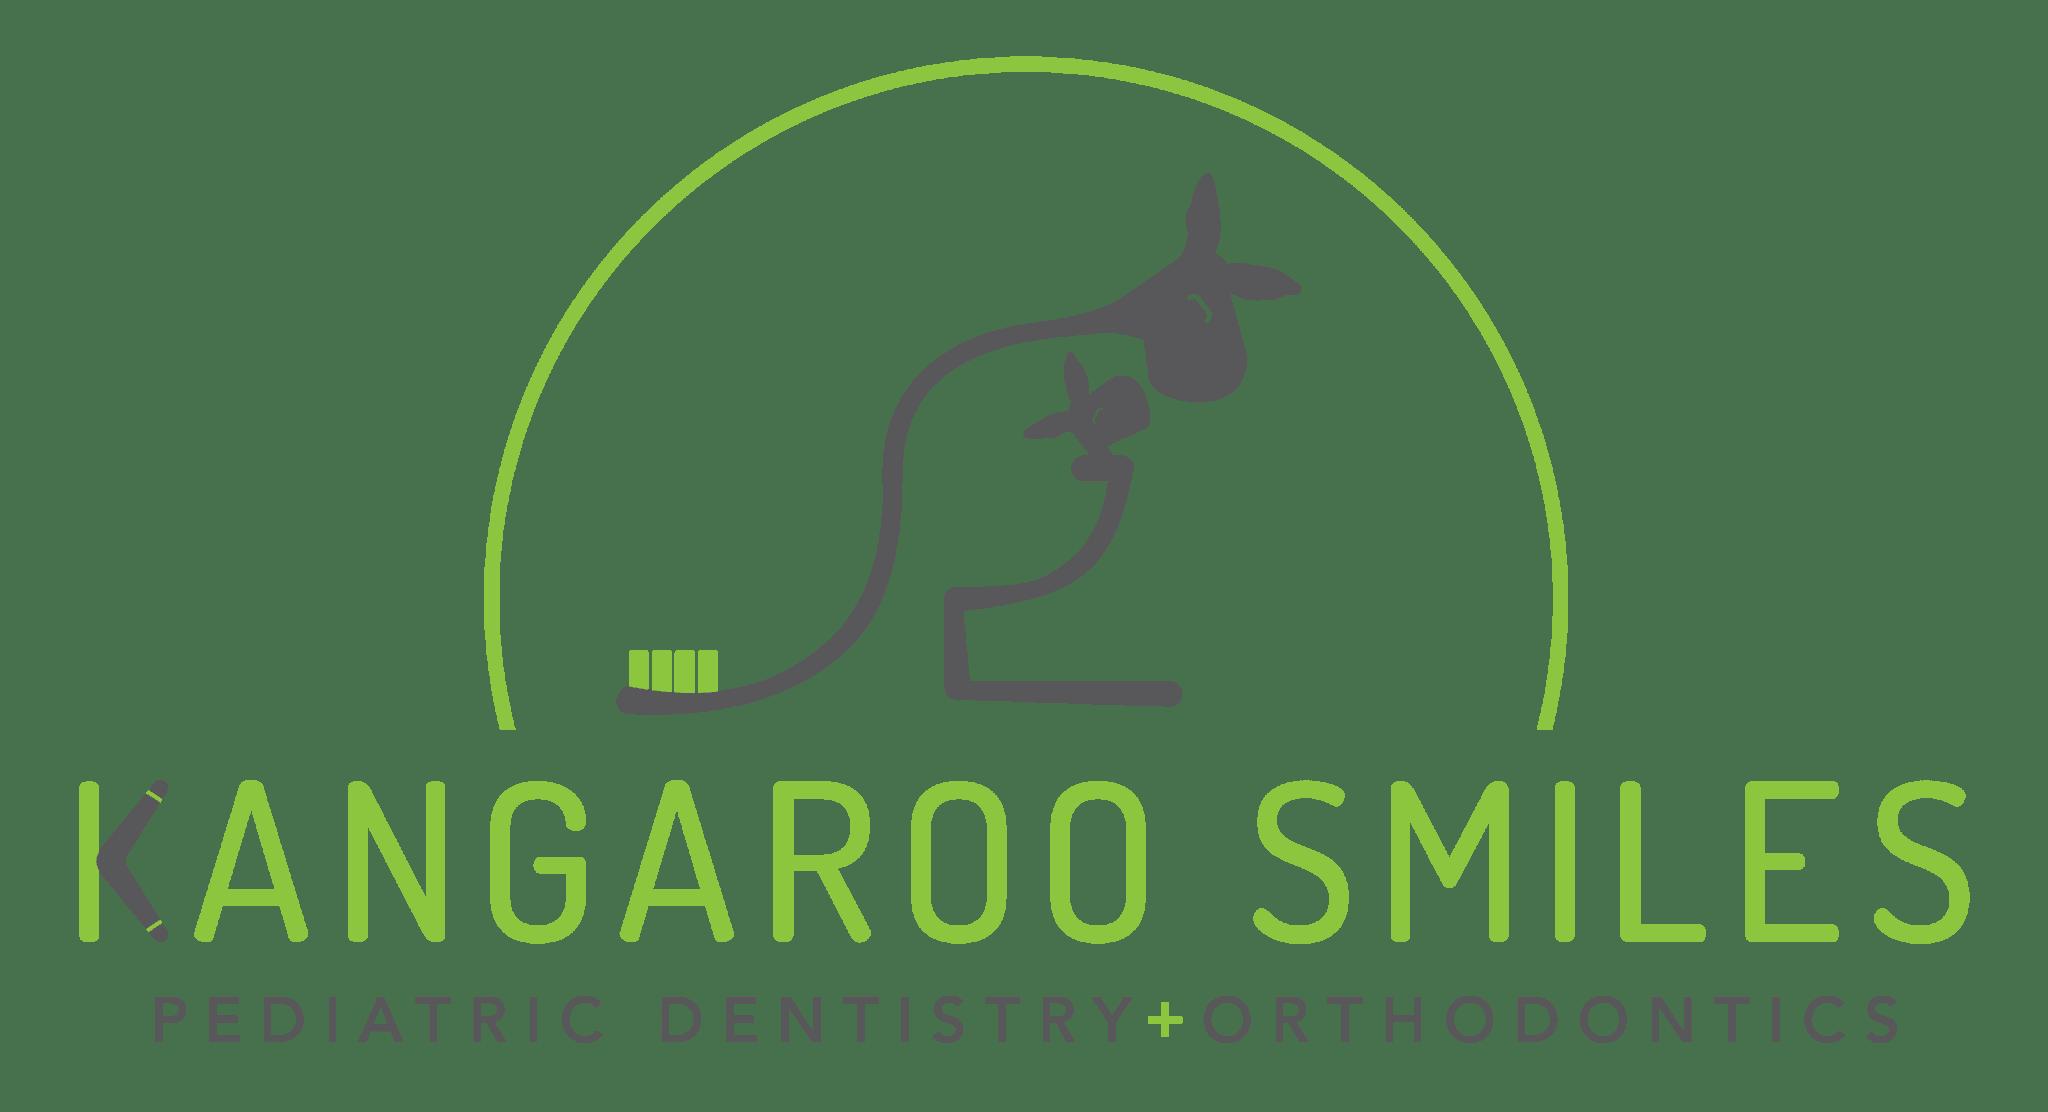 Kangaroo Smiles - Pediatric Dentistry + Orthodontics